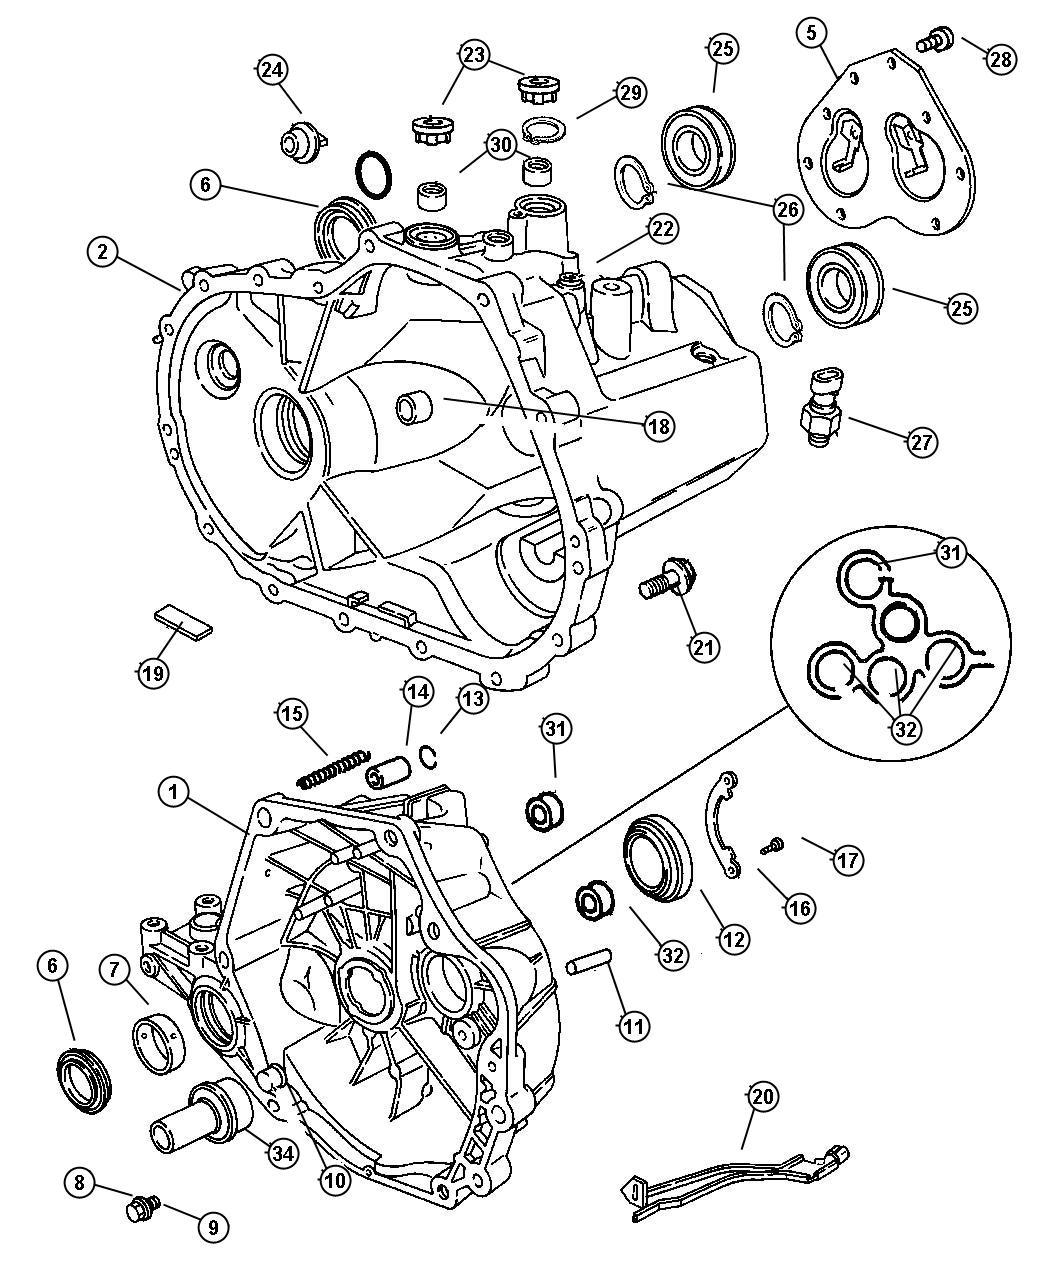 chrysler 3 8 serpentine belt diagram gm wiring color abbreviations 2005 pacifica v6 8l